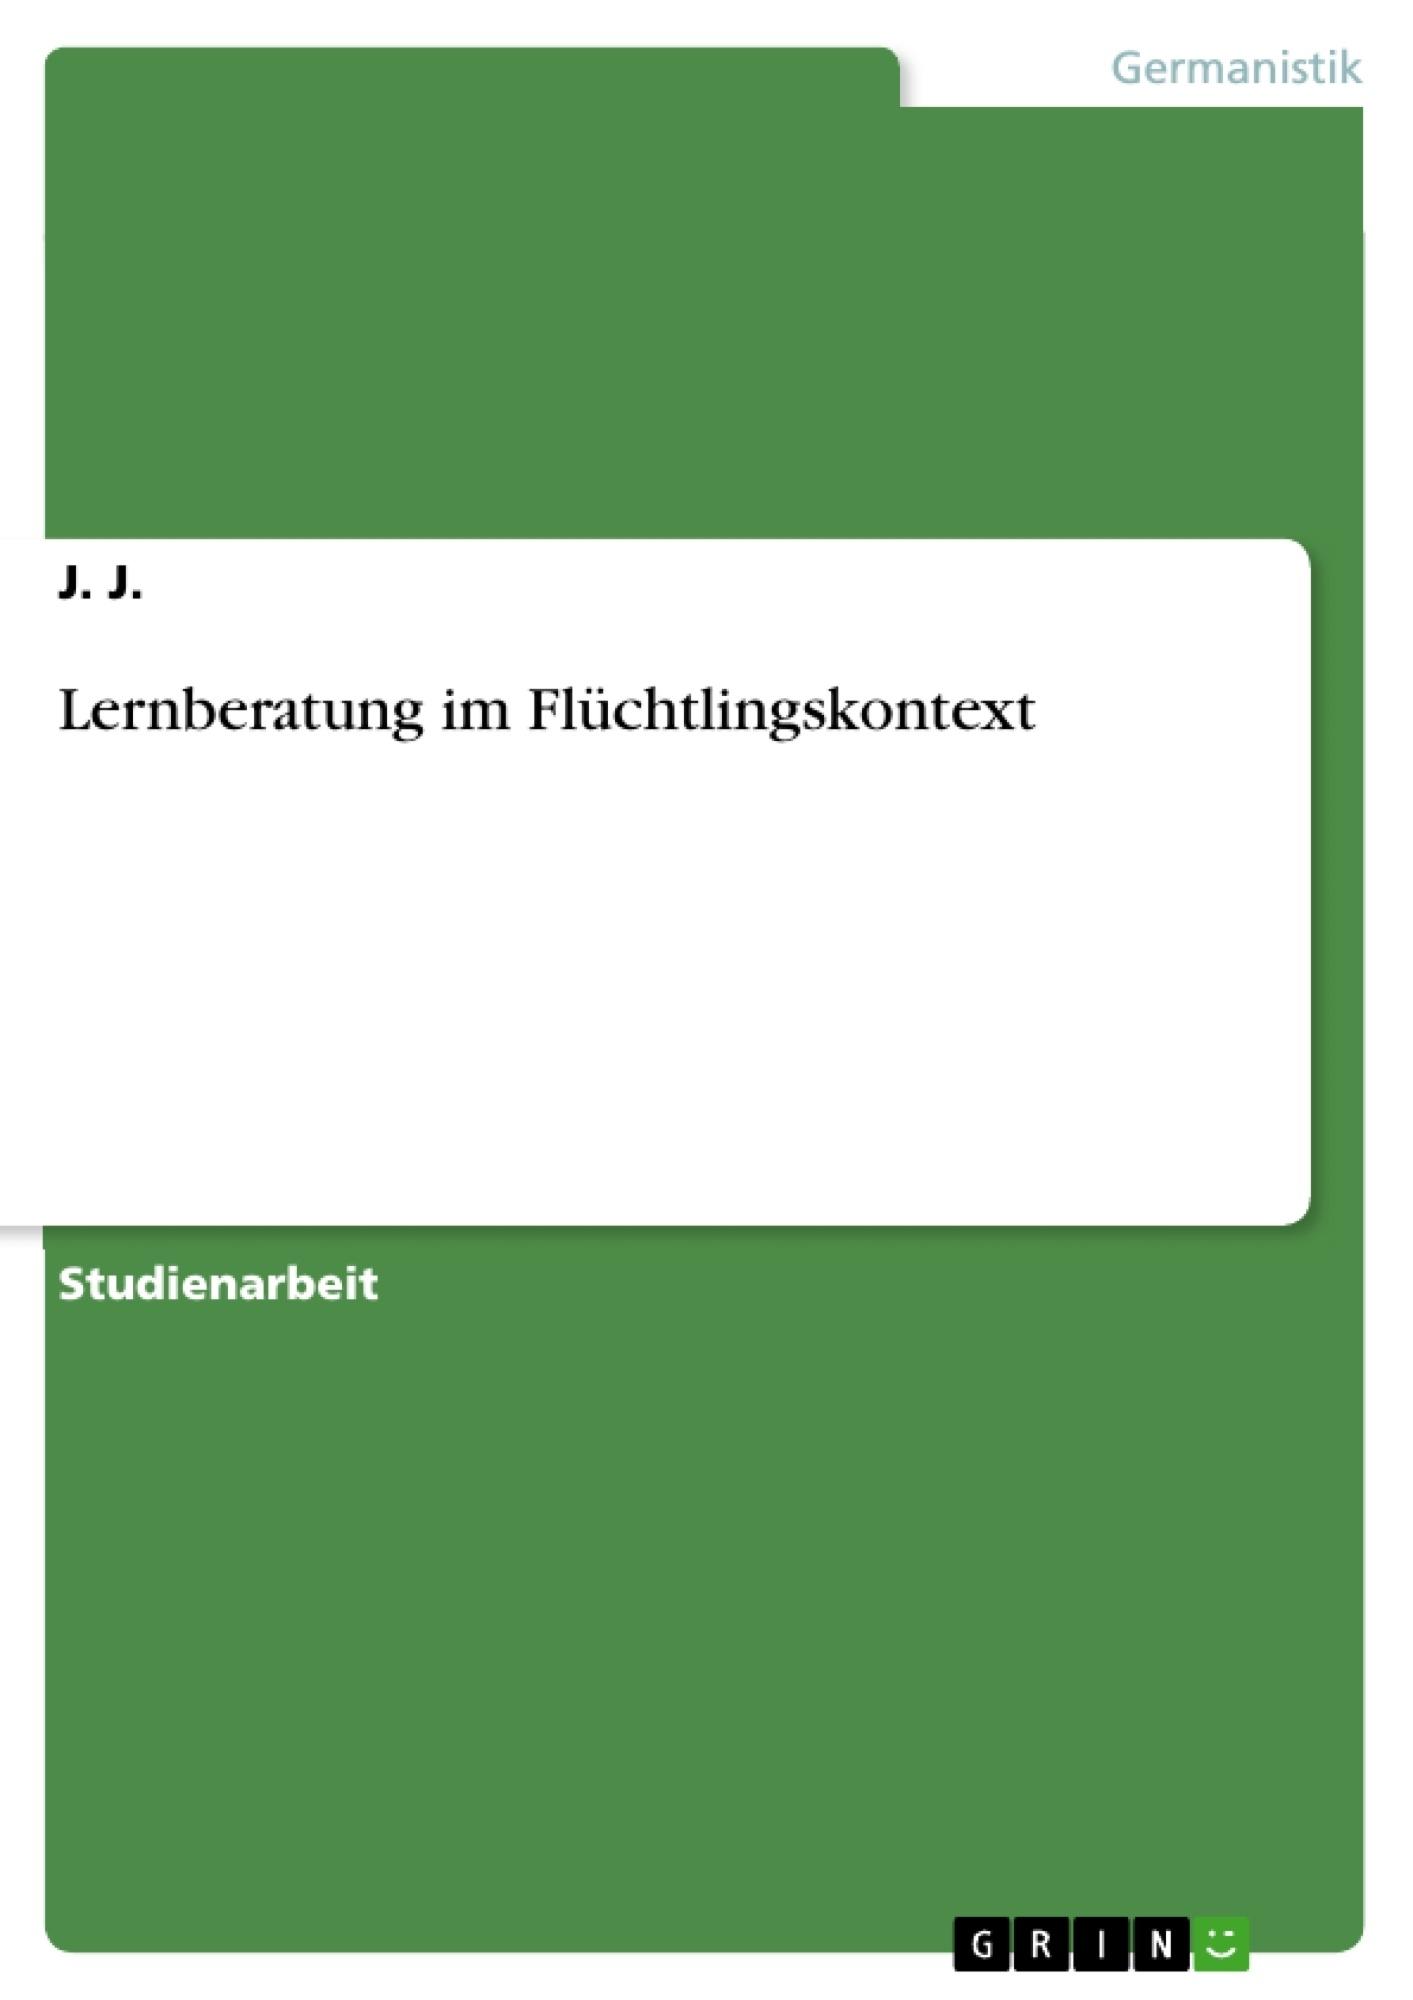 Titel: Lernberatung im Flüchtlingskontext